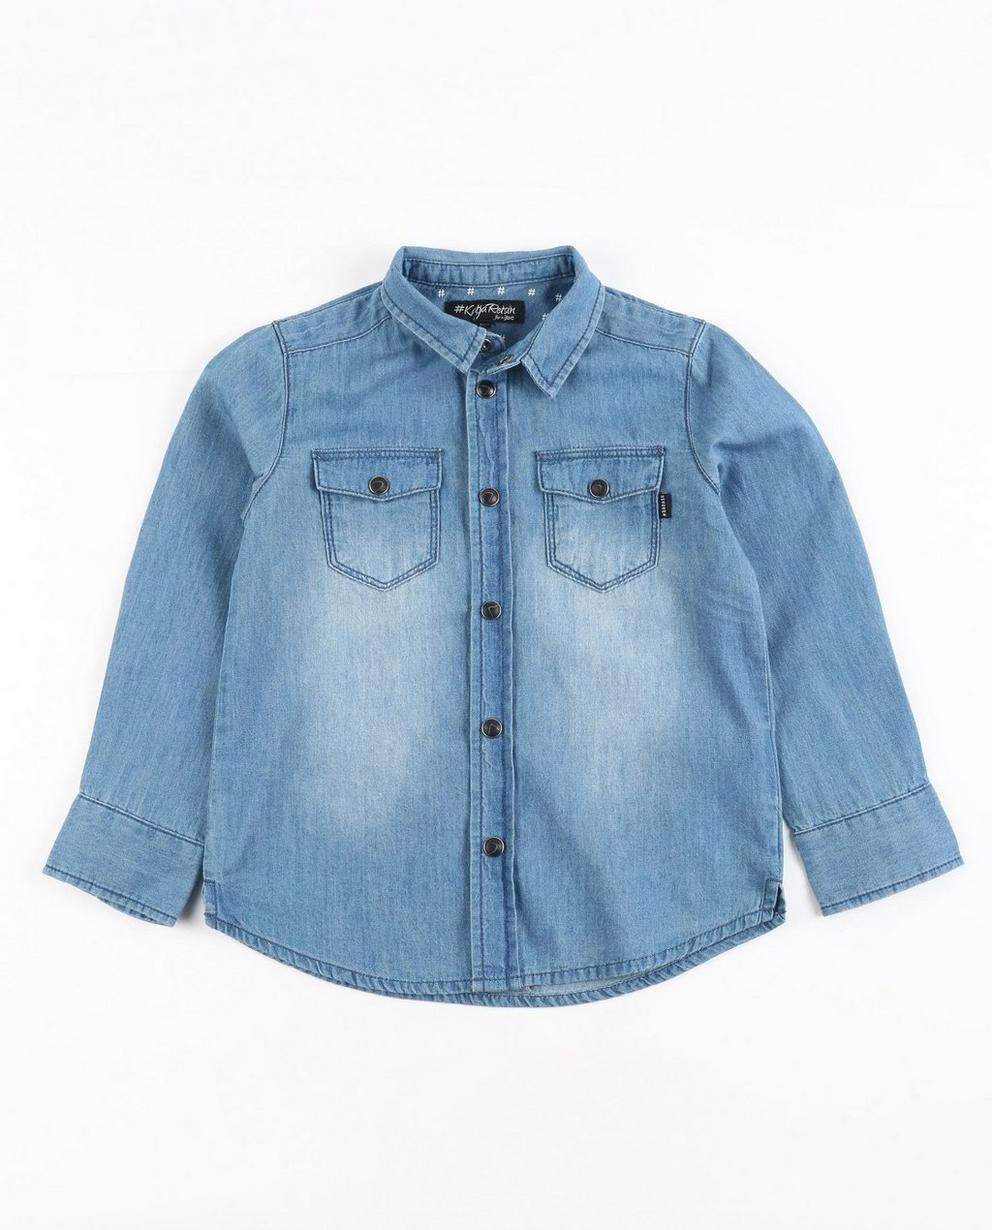 Verwassen jeanshemd - Katja Retsin - JBC